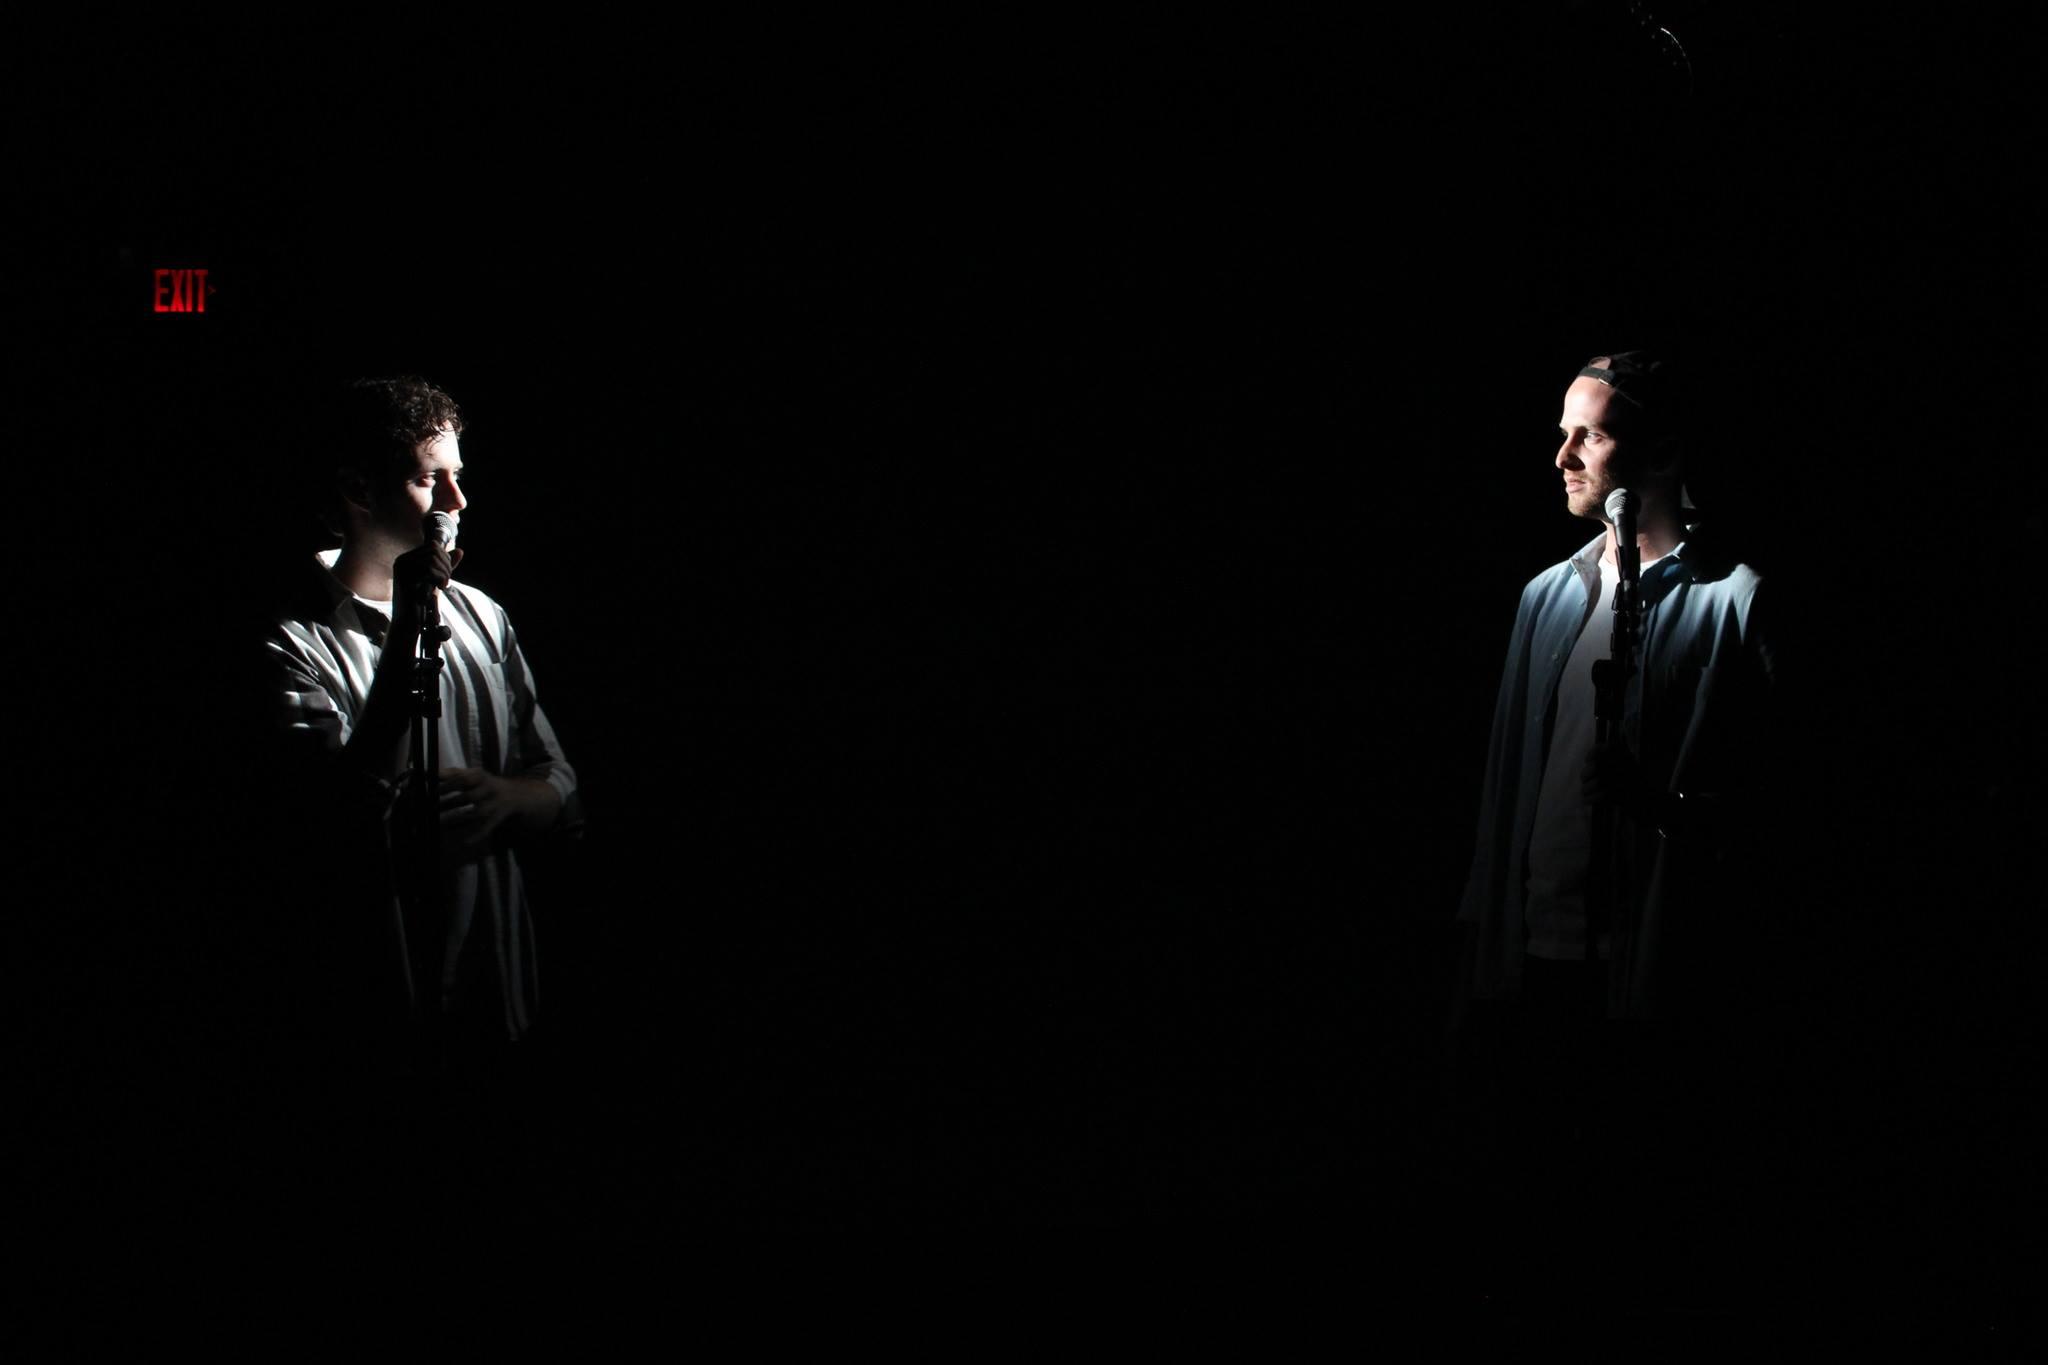 Patrick Foley, Michael Breslin (photos by Brittany Bland)